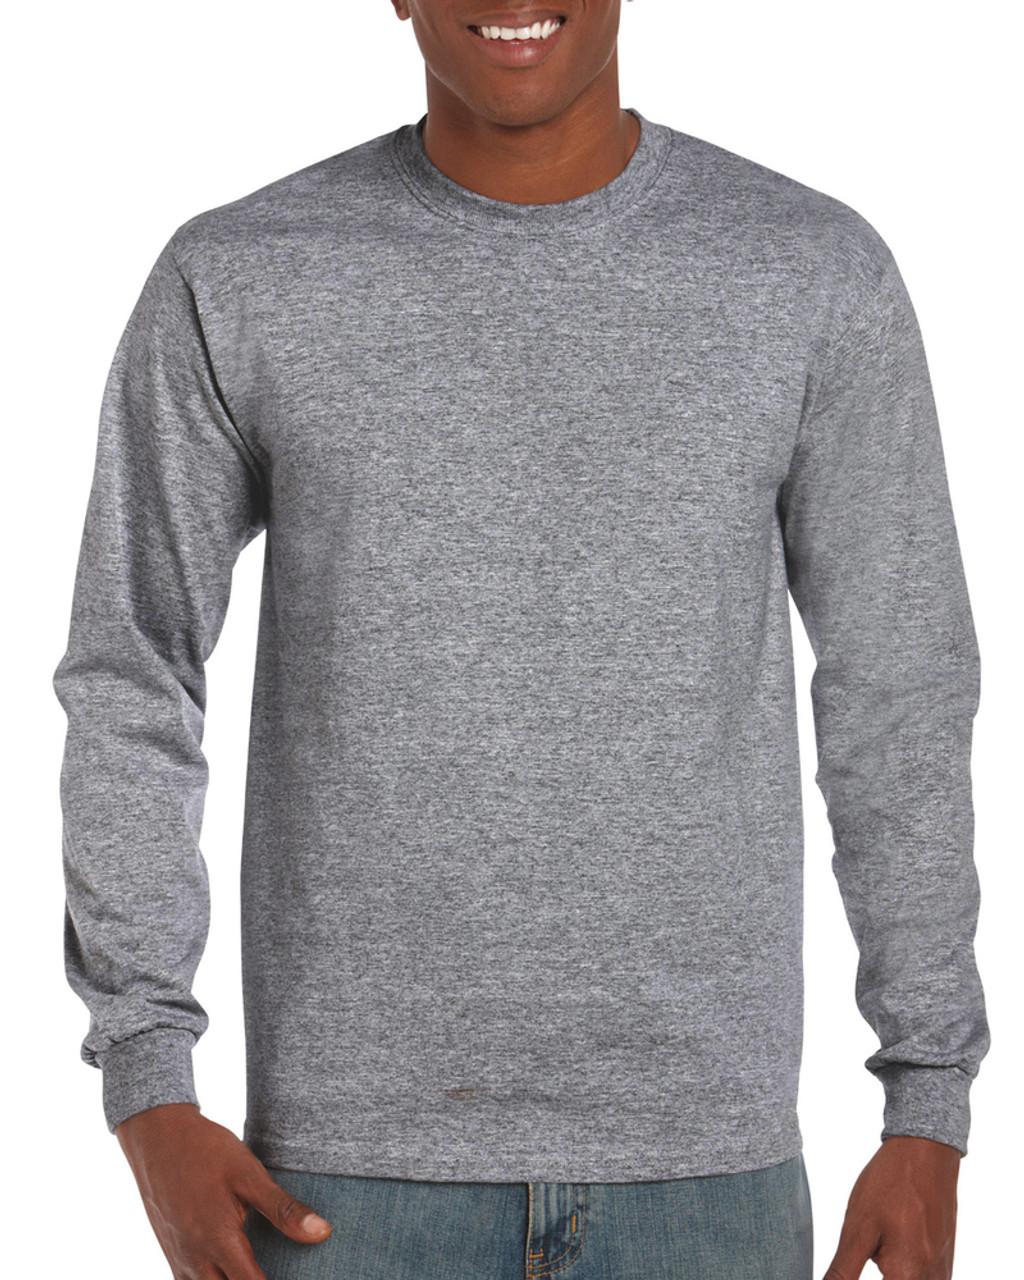 Gildan Mens Soft Style Long Sleeve T-Shirt BC488